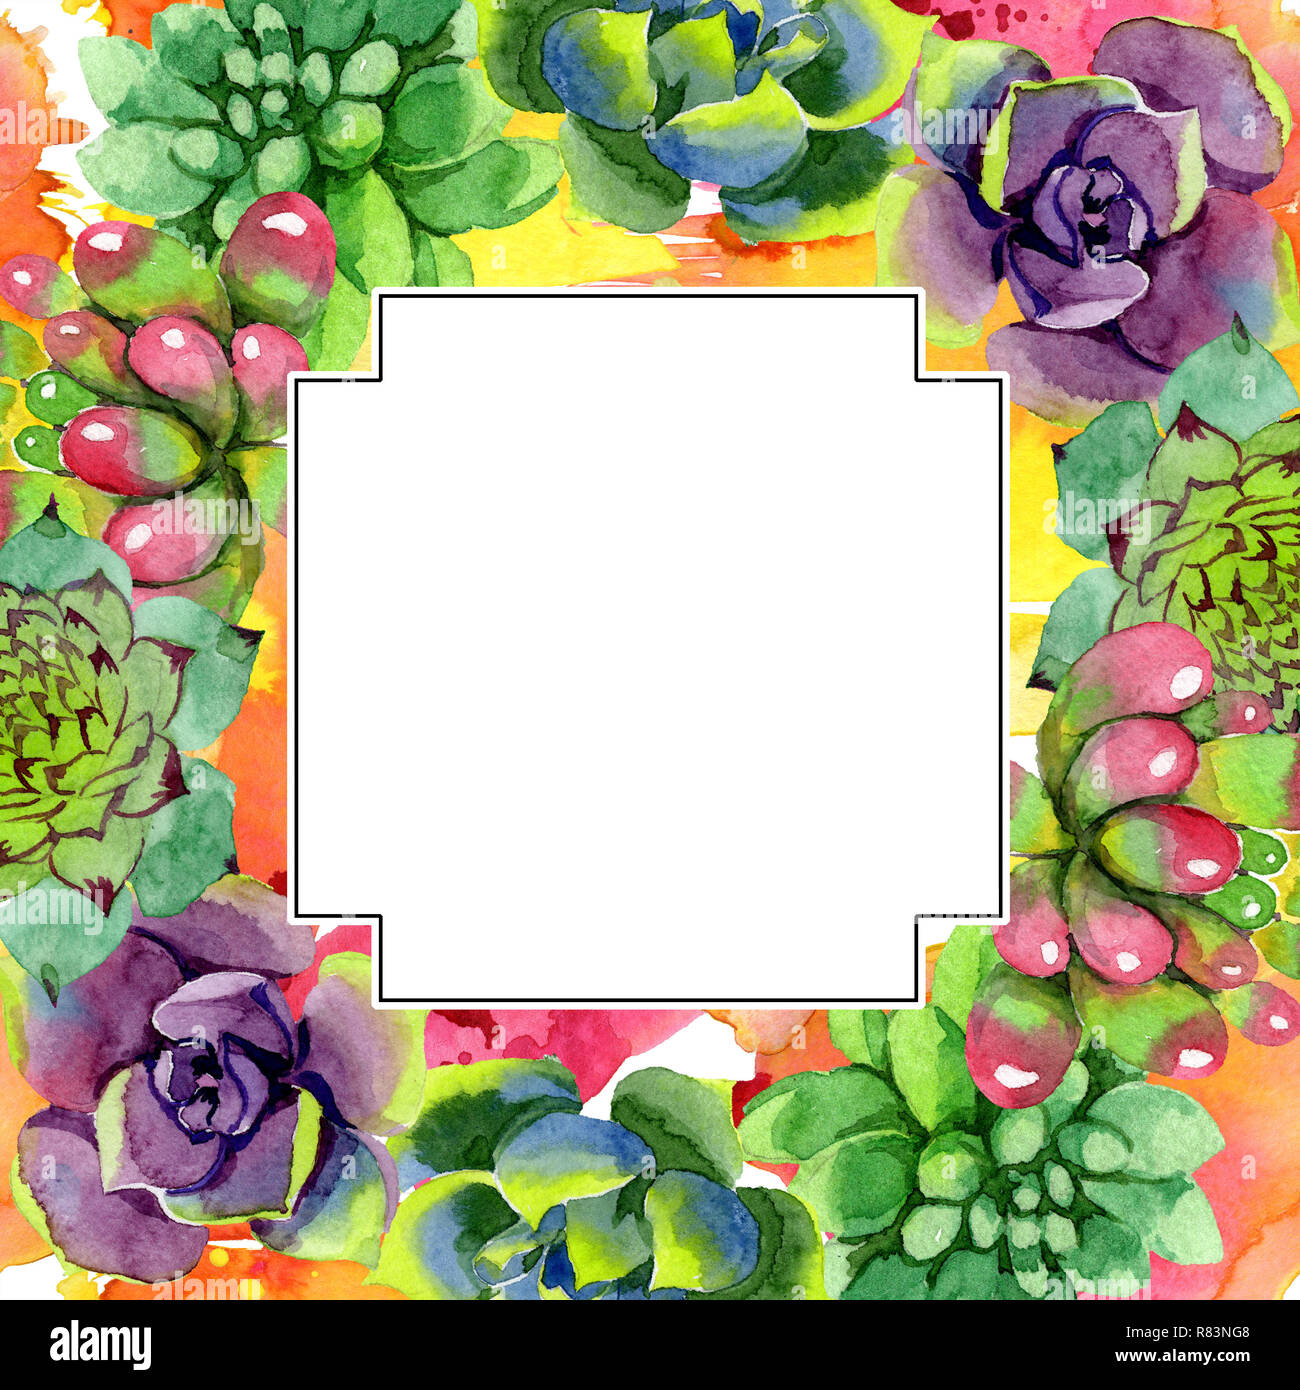 Amazing Succulent Floral Botanical Flower Watercolor Background Illustration Set Geometric Frame Square Aquarelle Hand Drawing Succulent Stock Photo Alamy